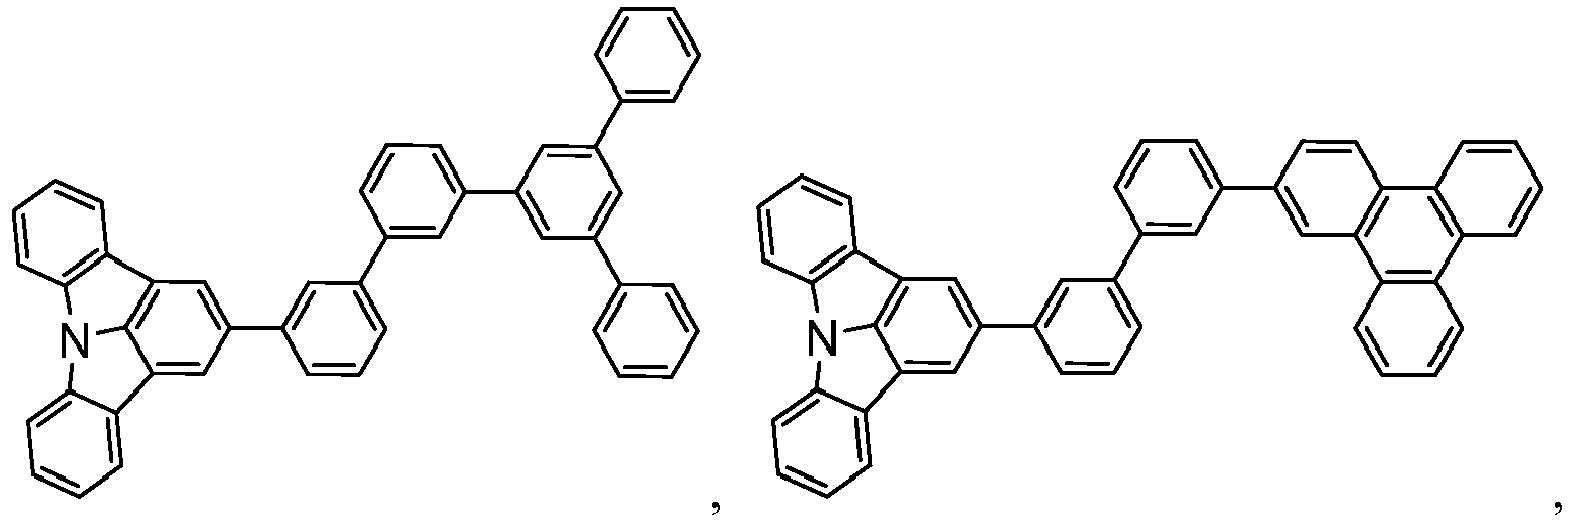 Figure imgb0899